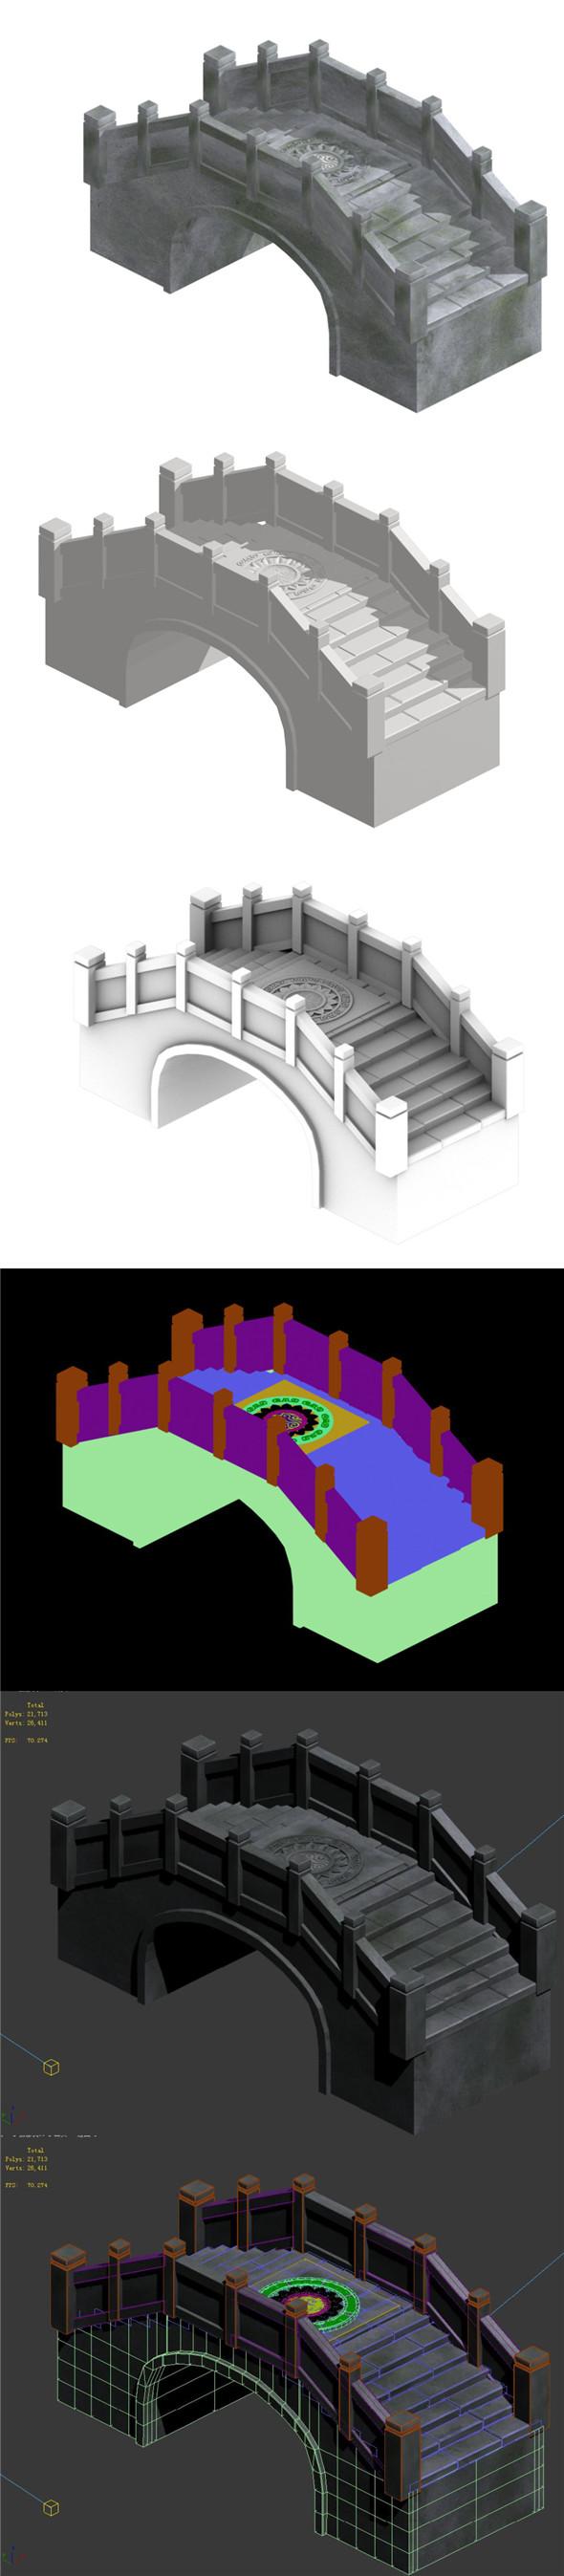 Stone arch bridge - 3DOcean Item for Sale